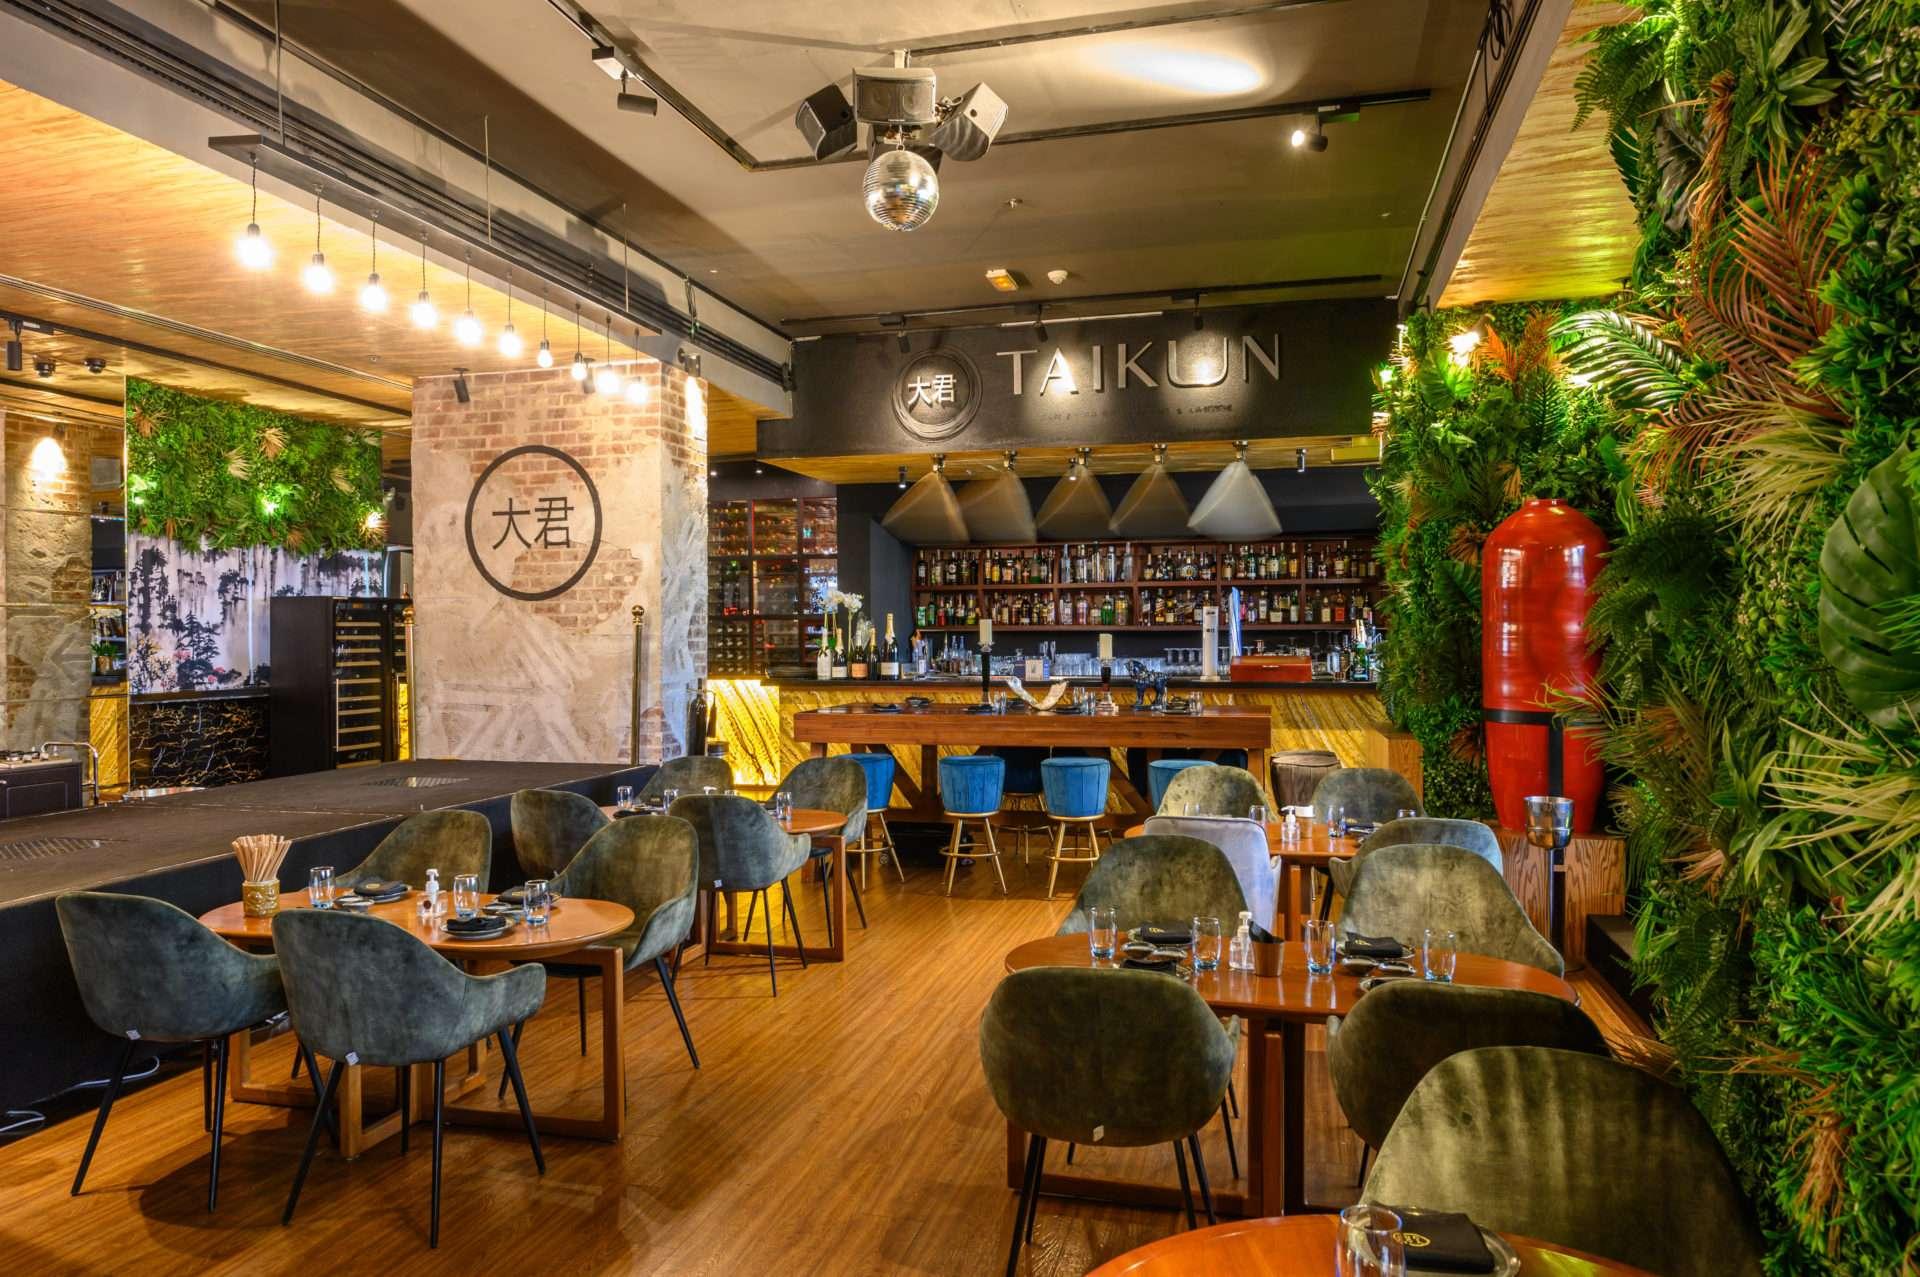 Taikun Pan Asian Restaurant & Lounge, Vida Downtown